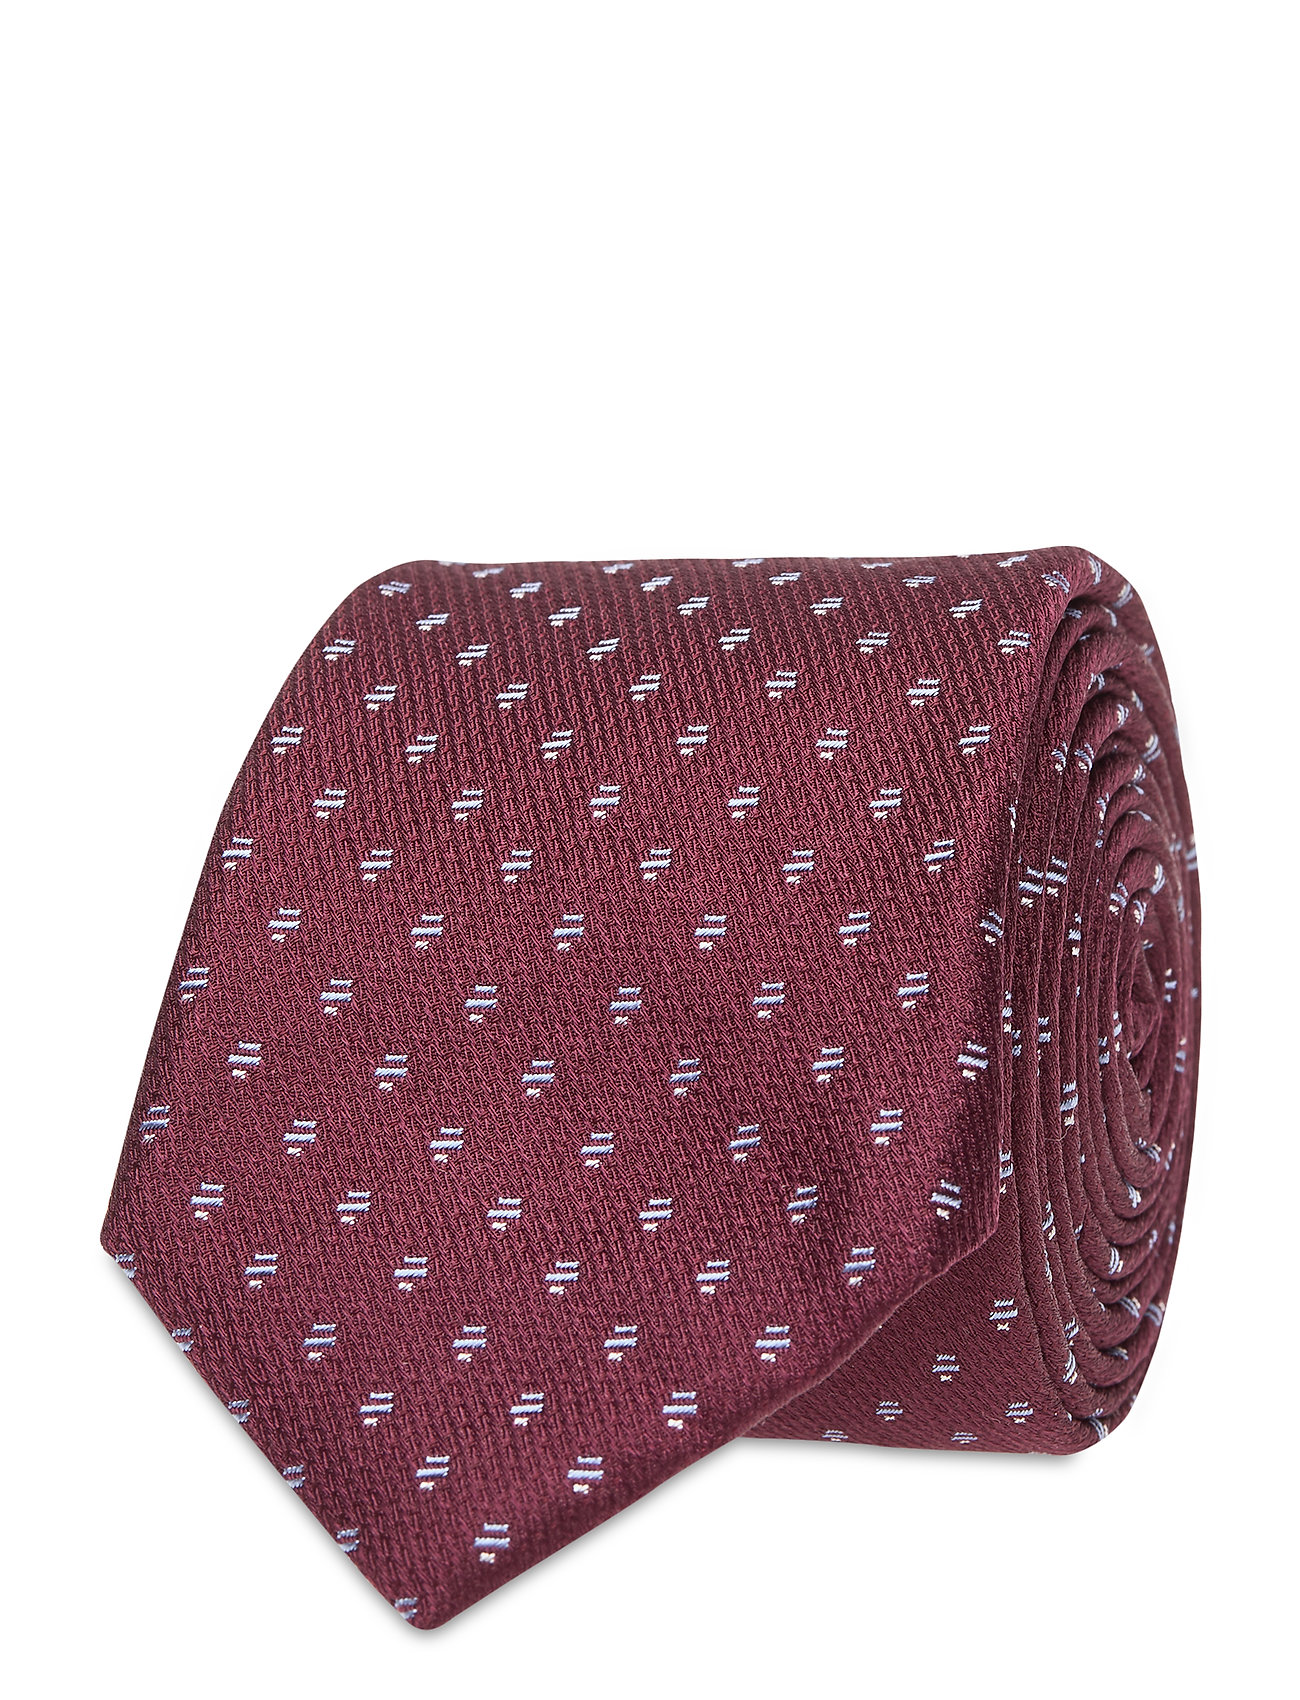 Image of Tie 6 Cm Slips Rød BOSS (3453850045)